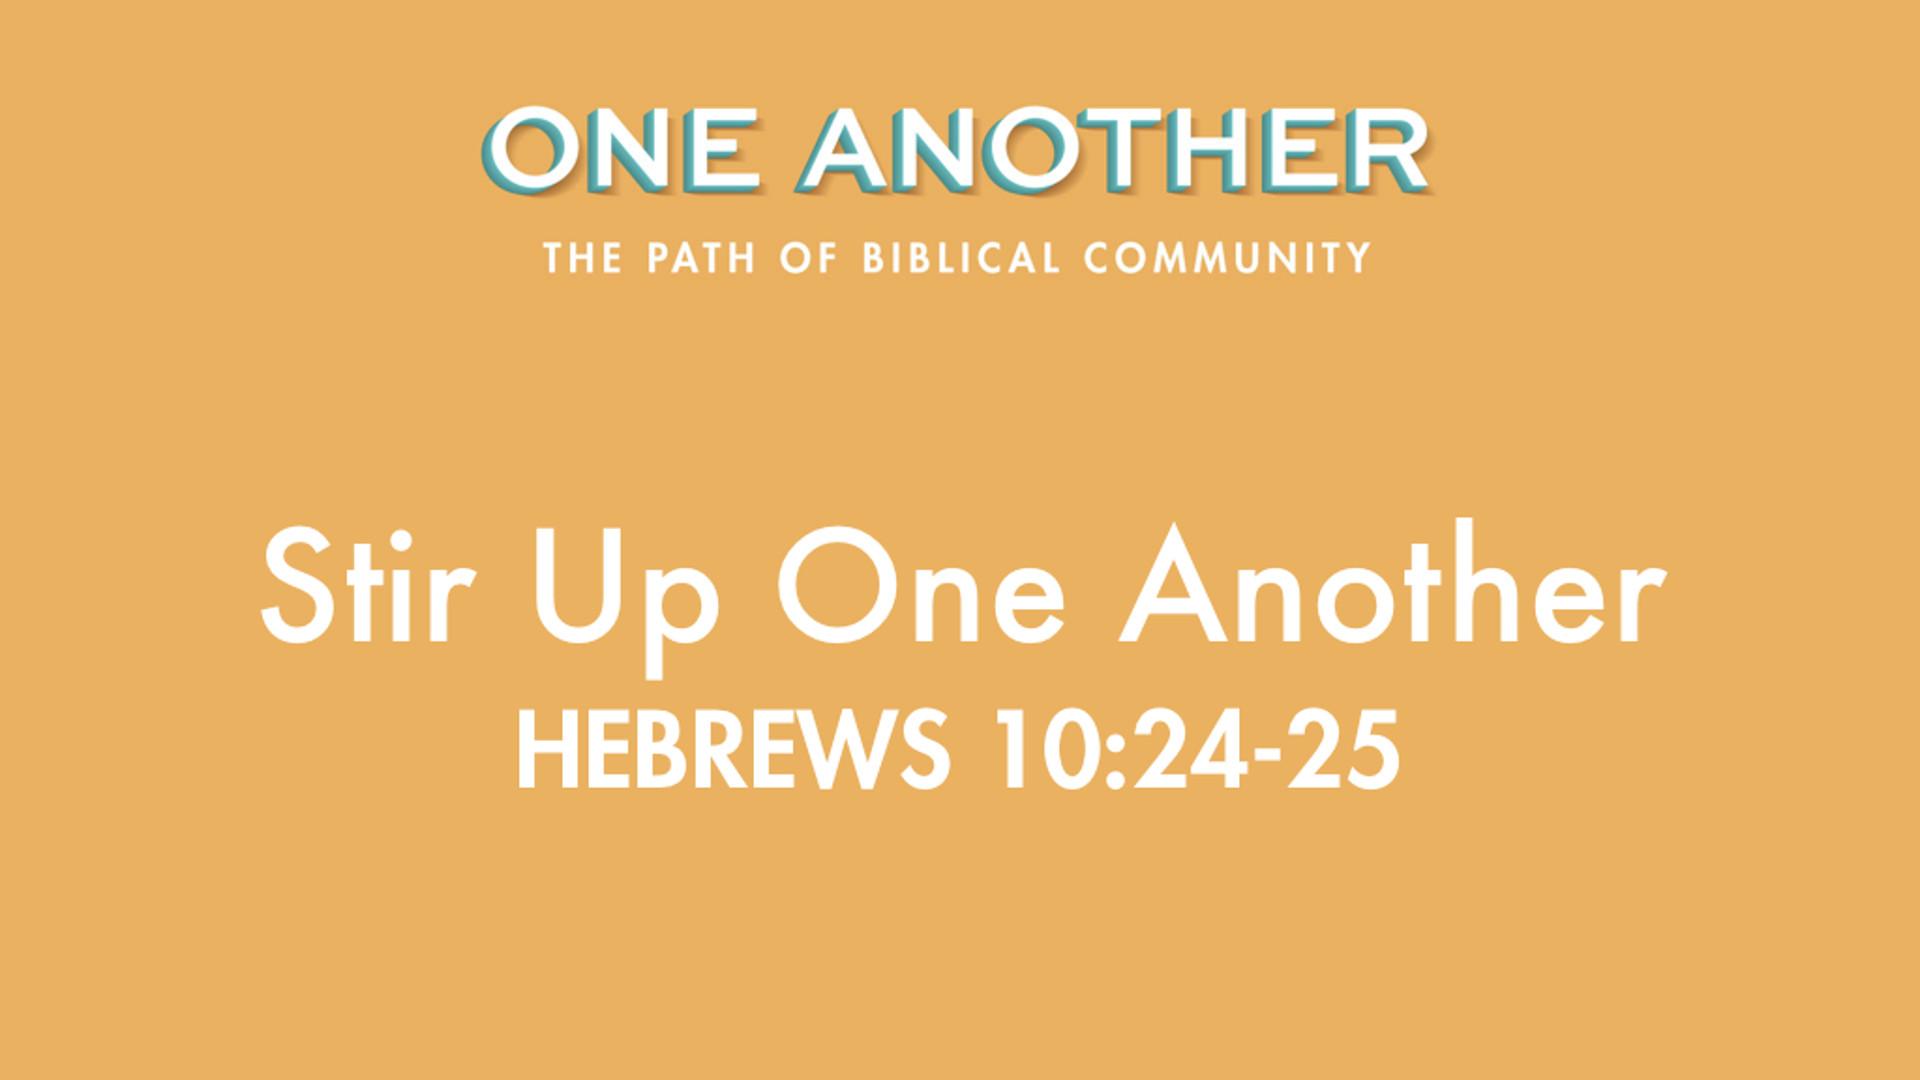 5Stir Up One Another - Hebrews 10.24-25.jpg